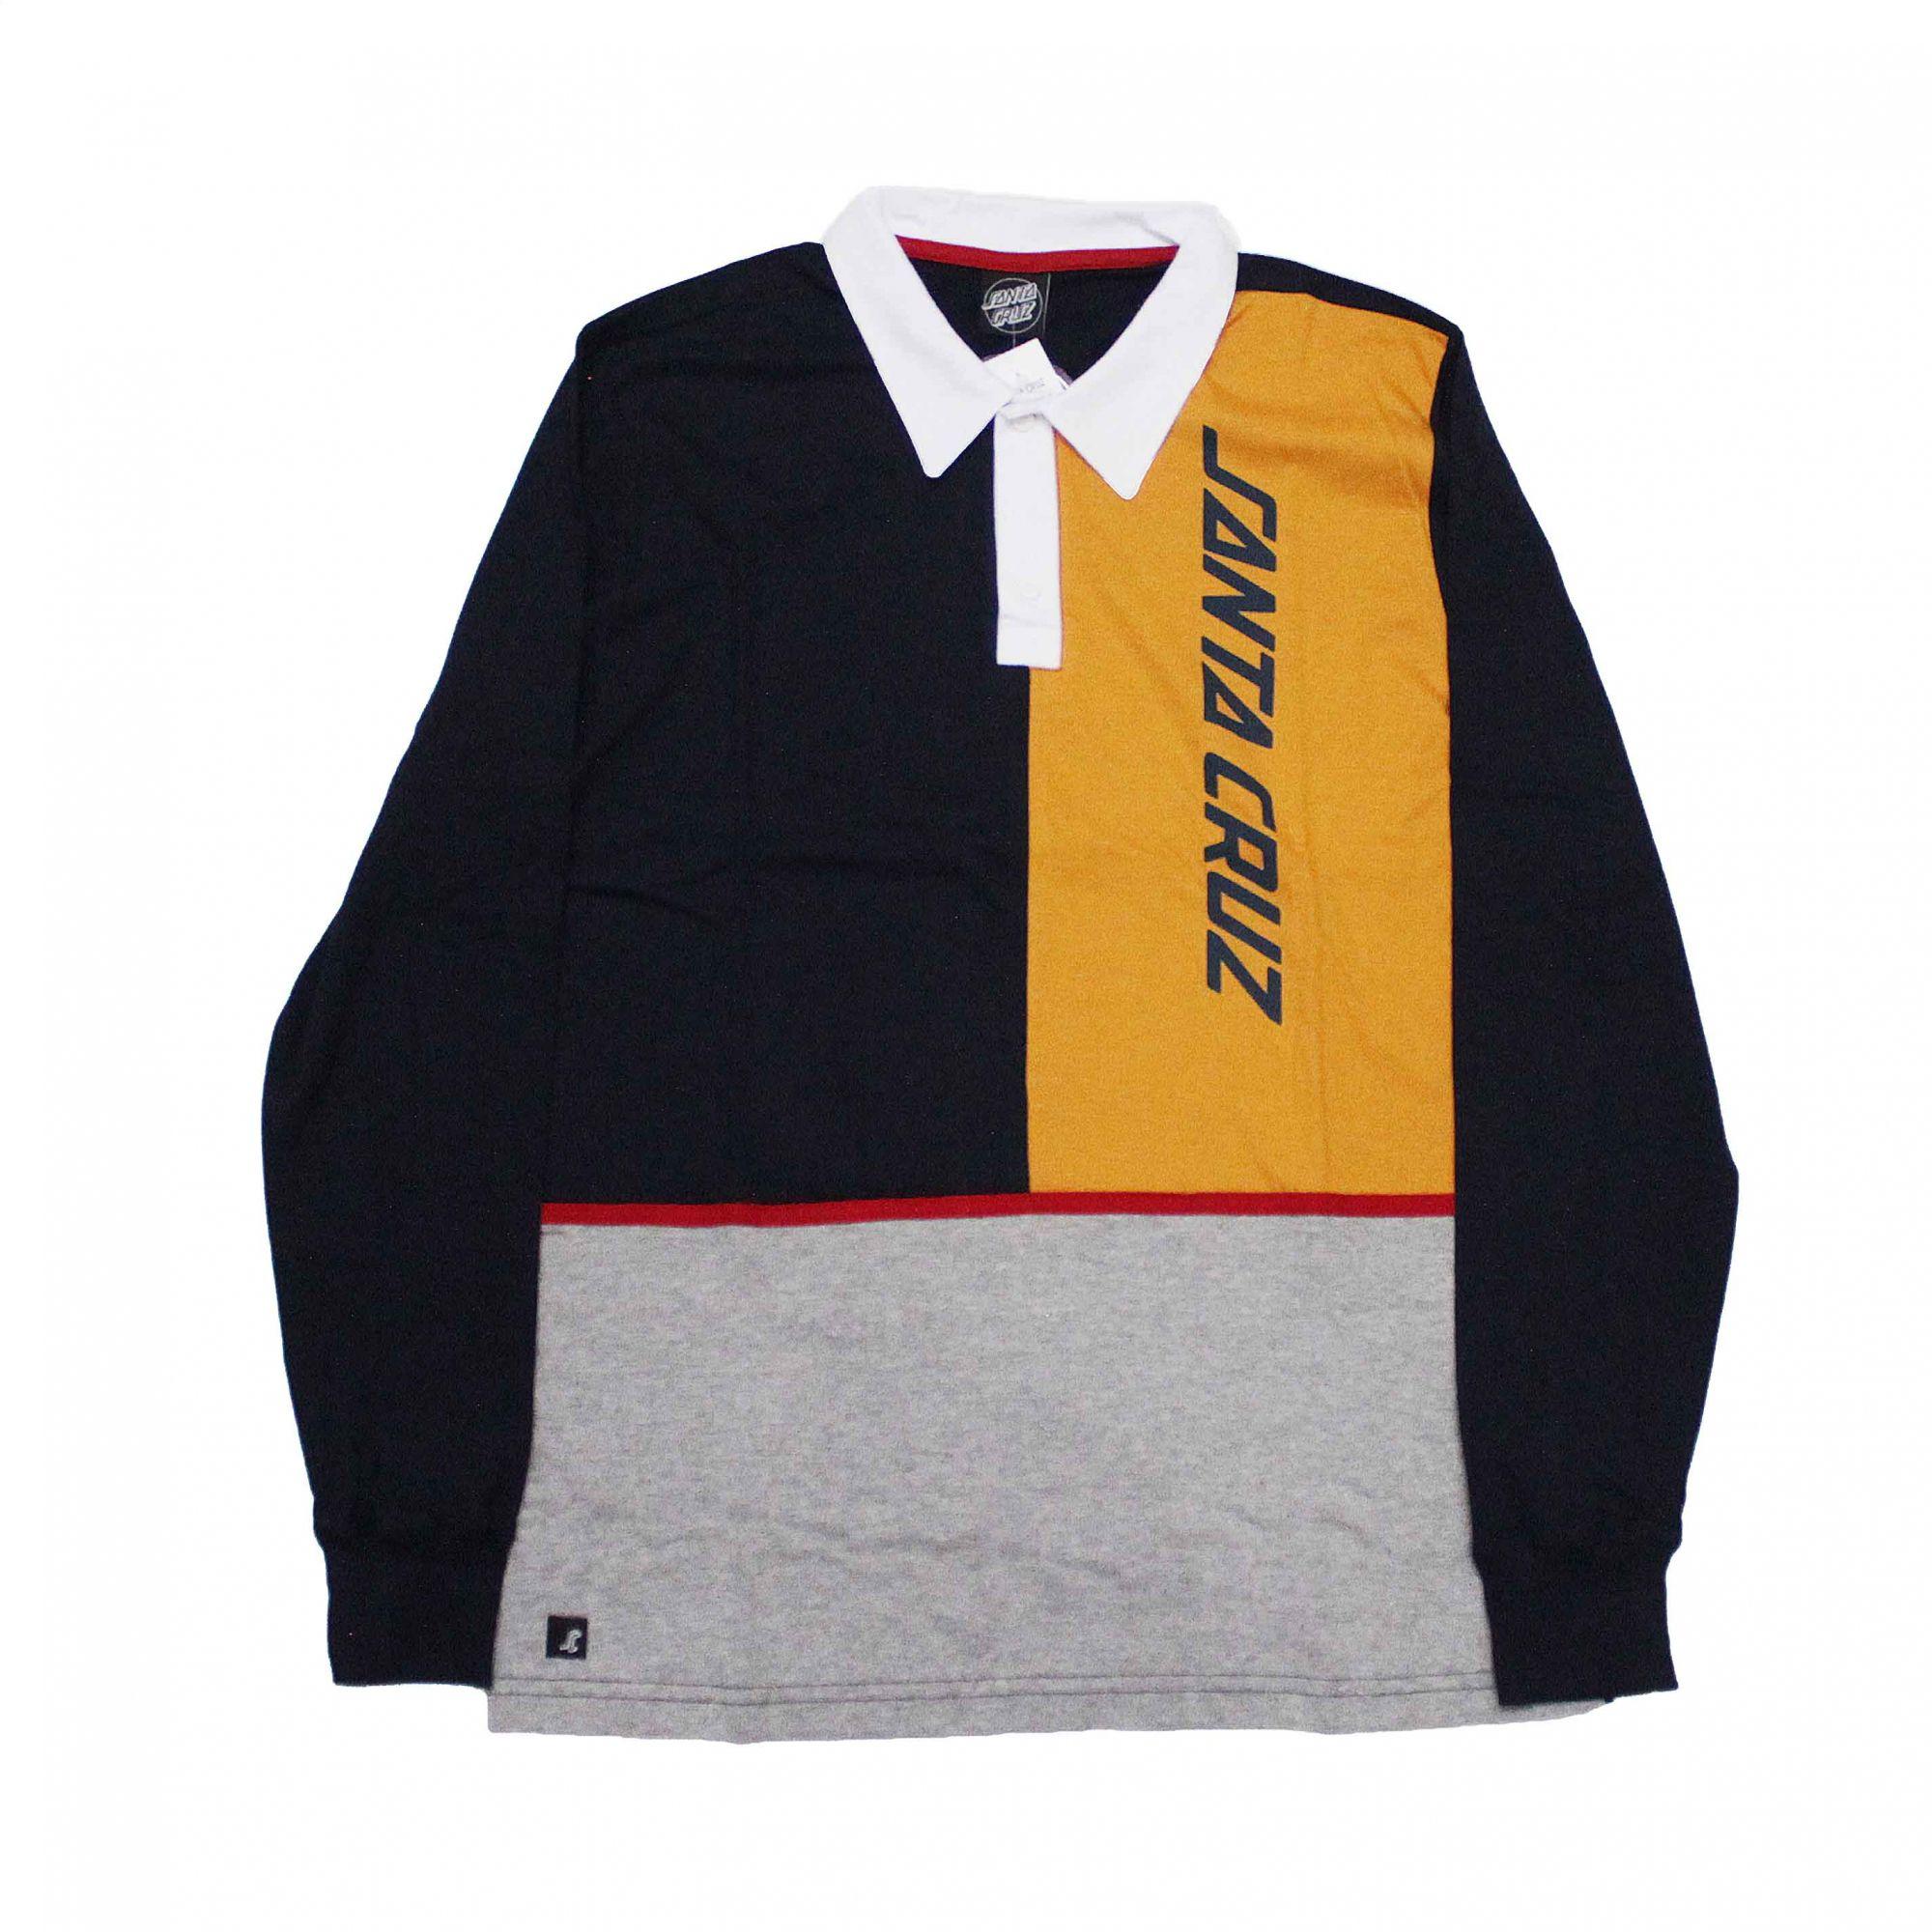 Camiseta Manga Longa Santa Cruz Polo Regulete Azul Marinho/Amarelo